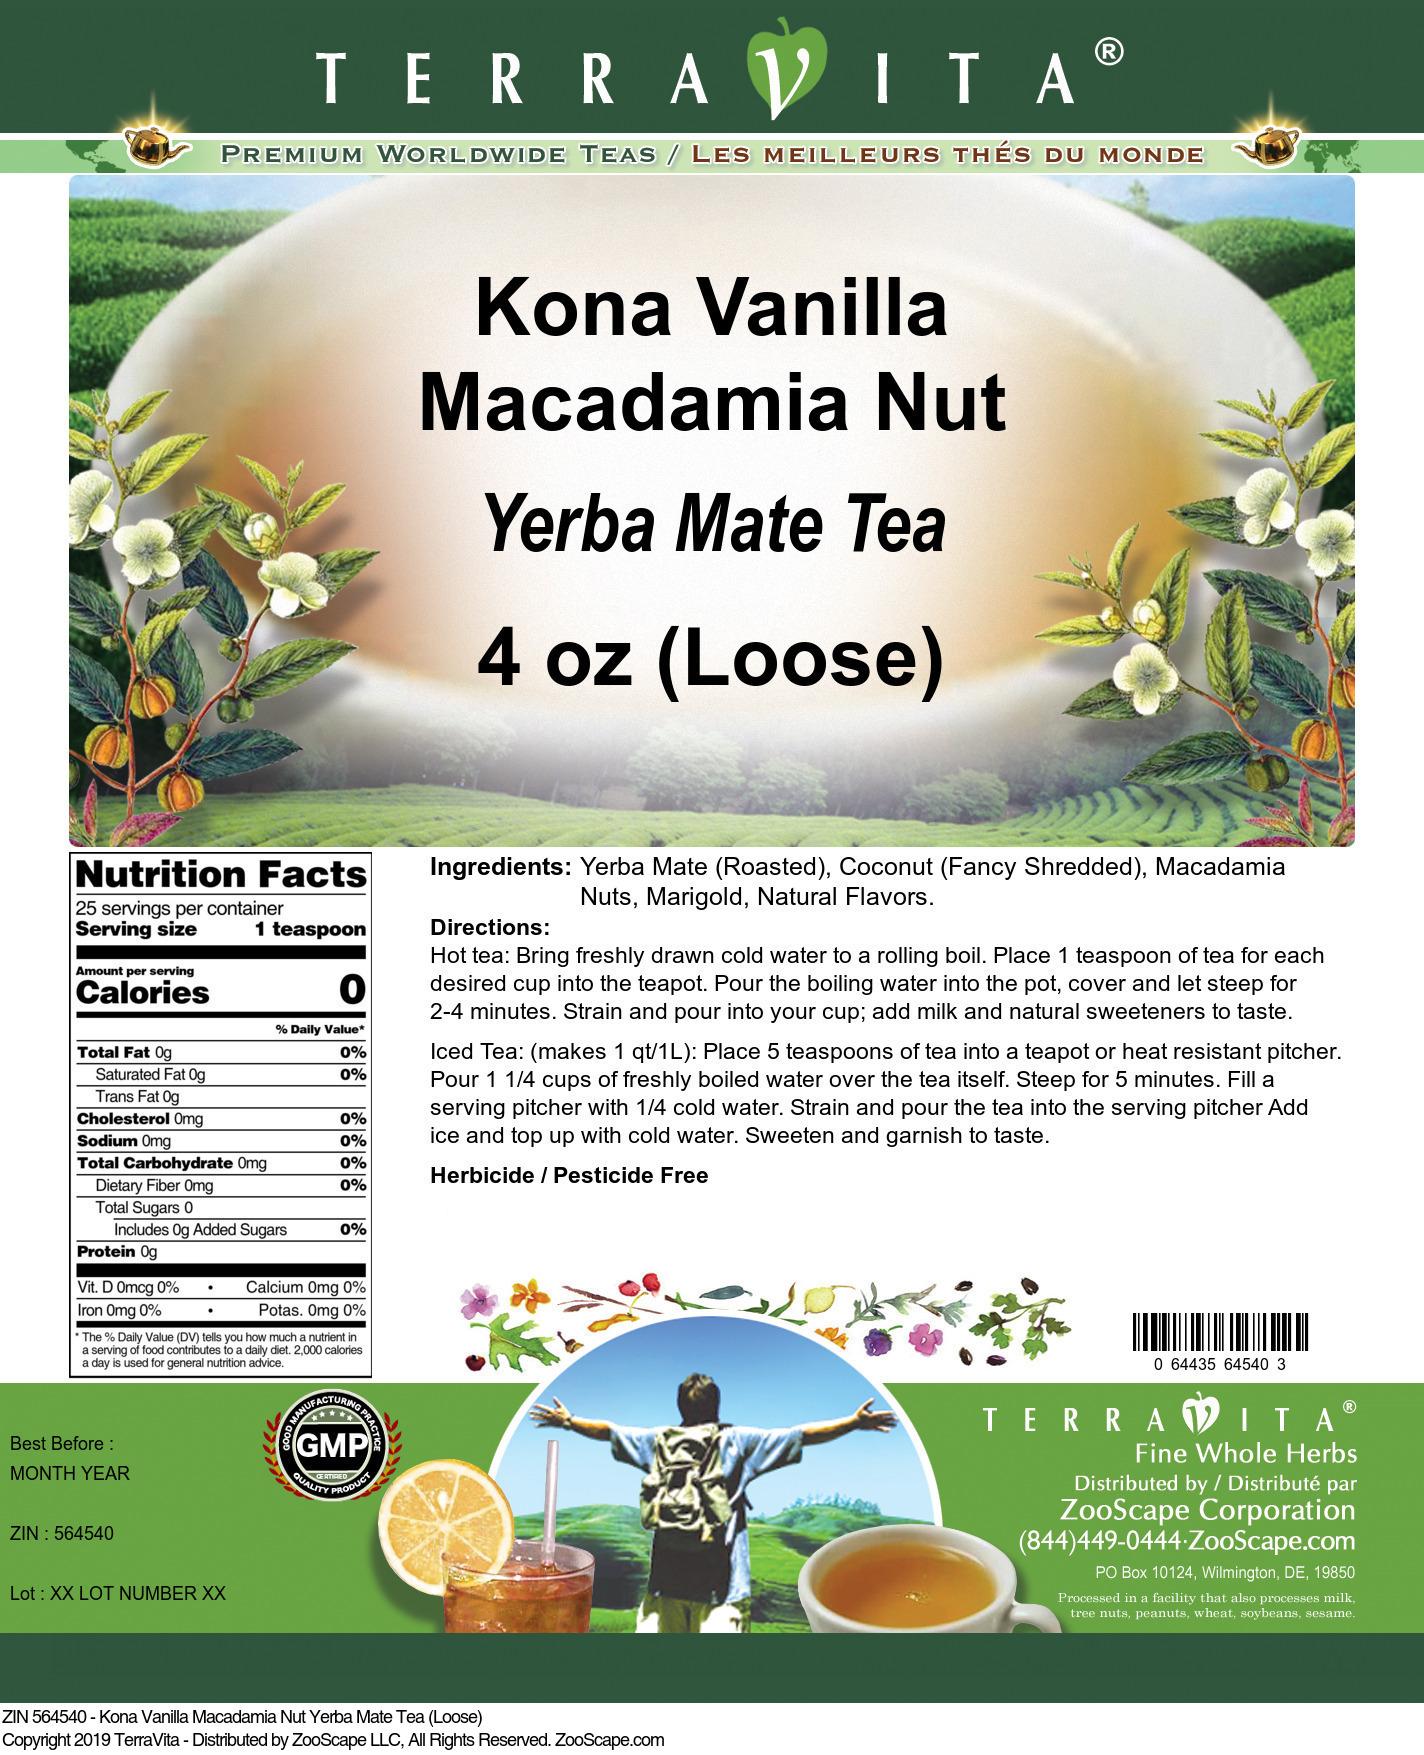 Kona Vanilla Macadamia Nut Yerba Mate Tea (Loose)